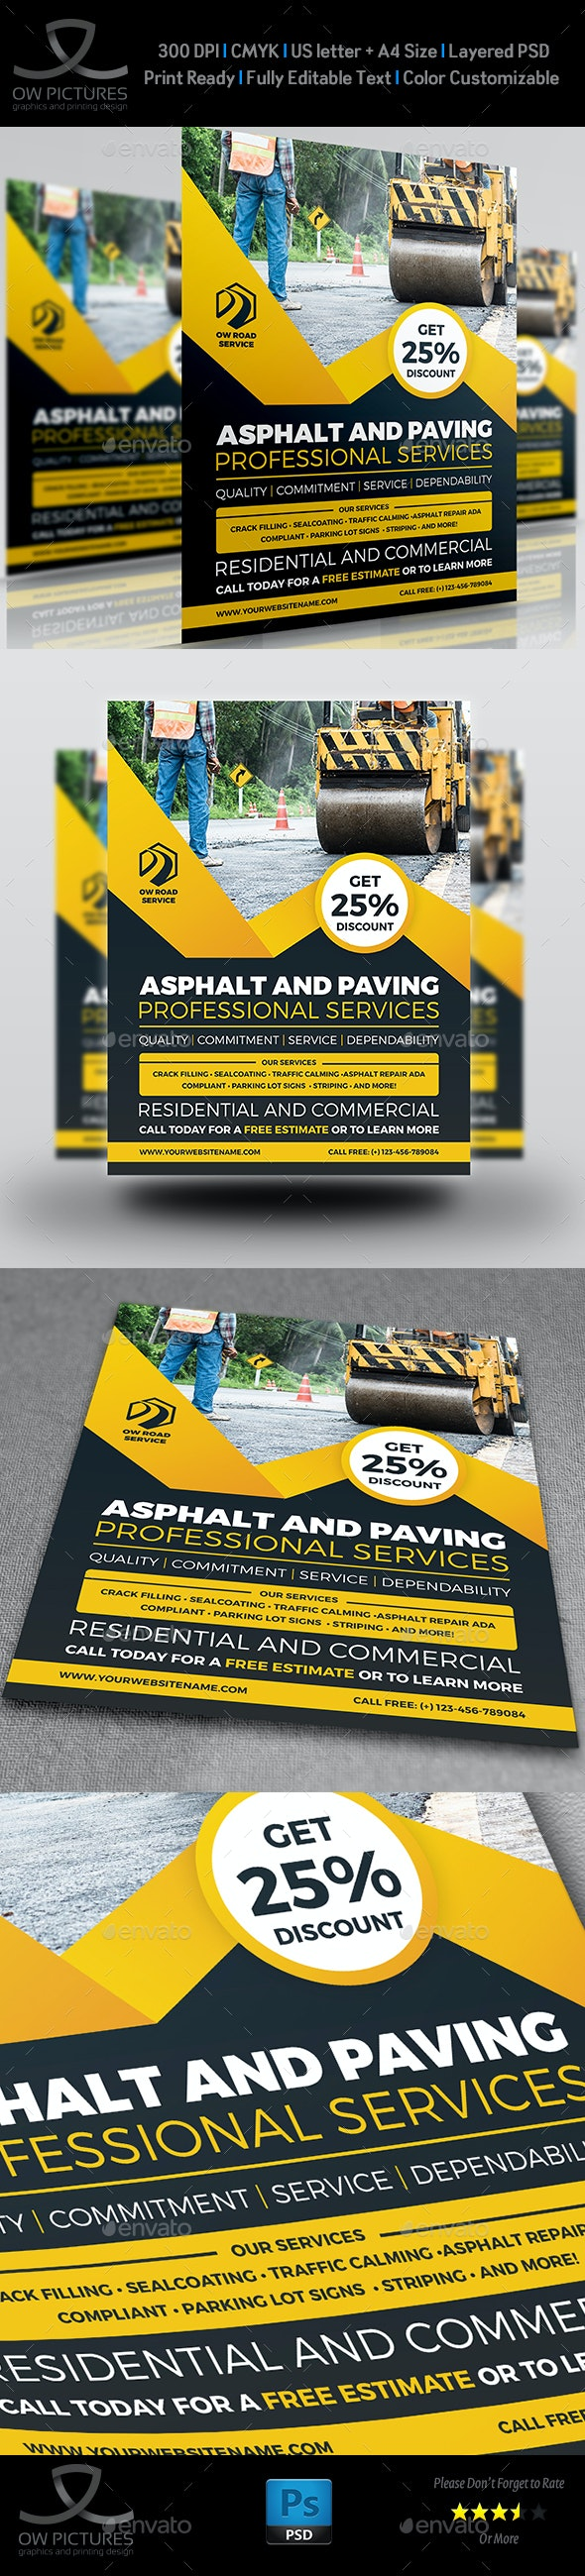 Asphalt and Paving Services Flyer Template - Flyers Print Templates